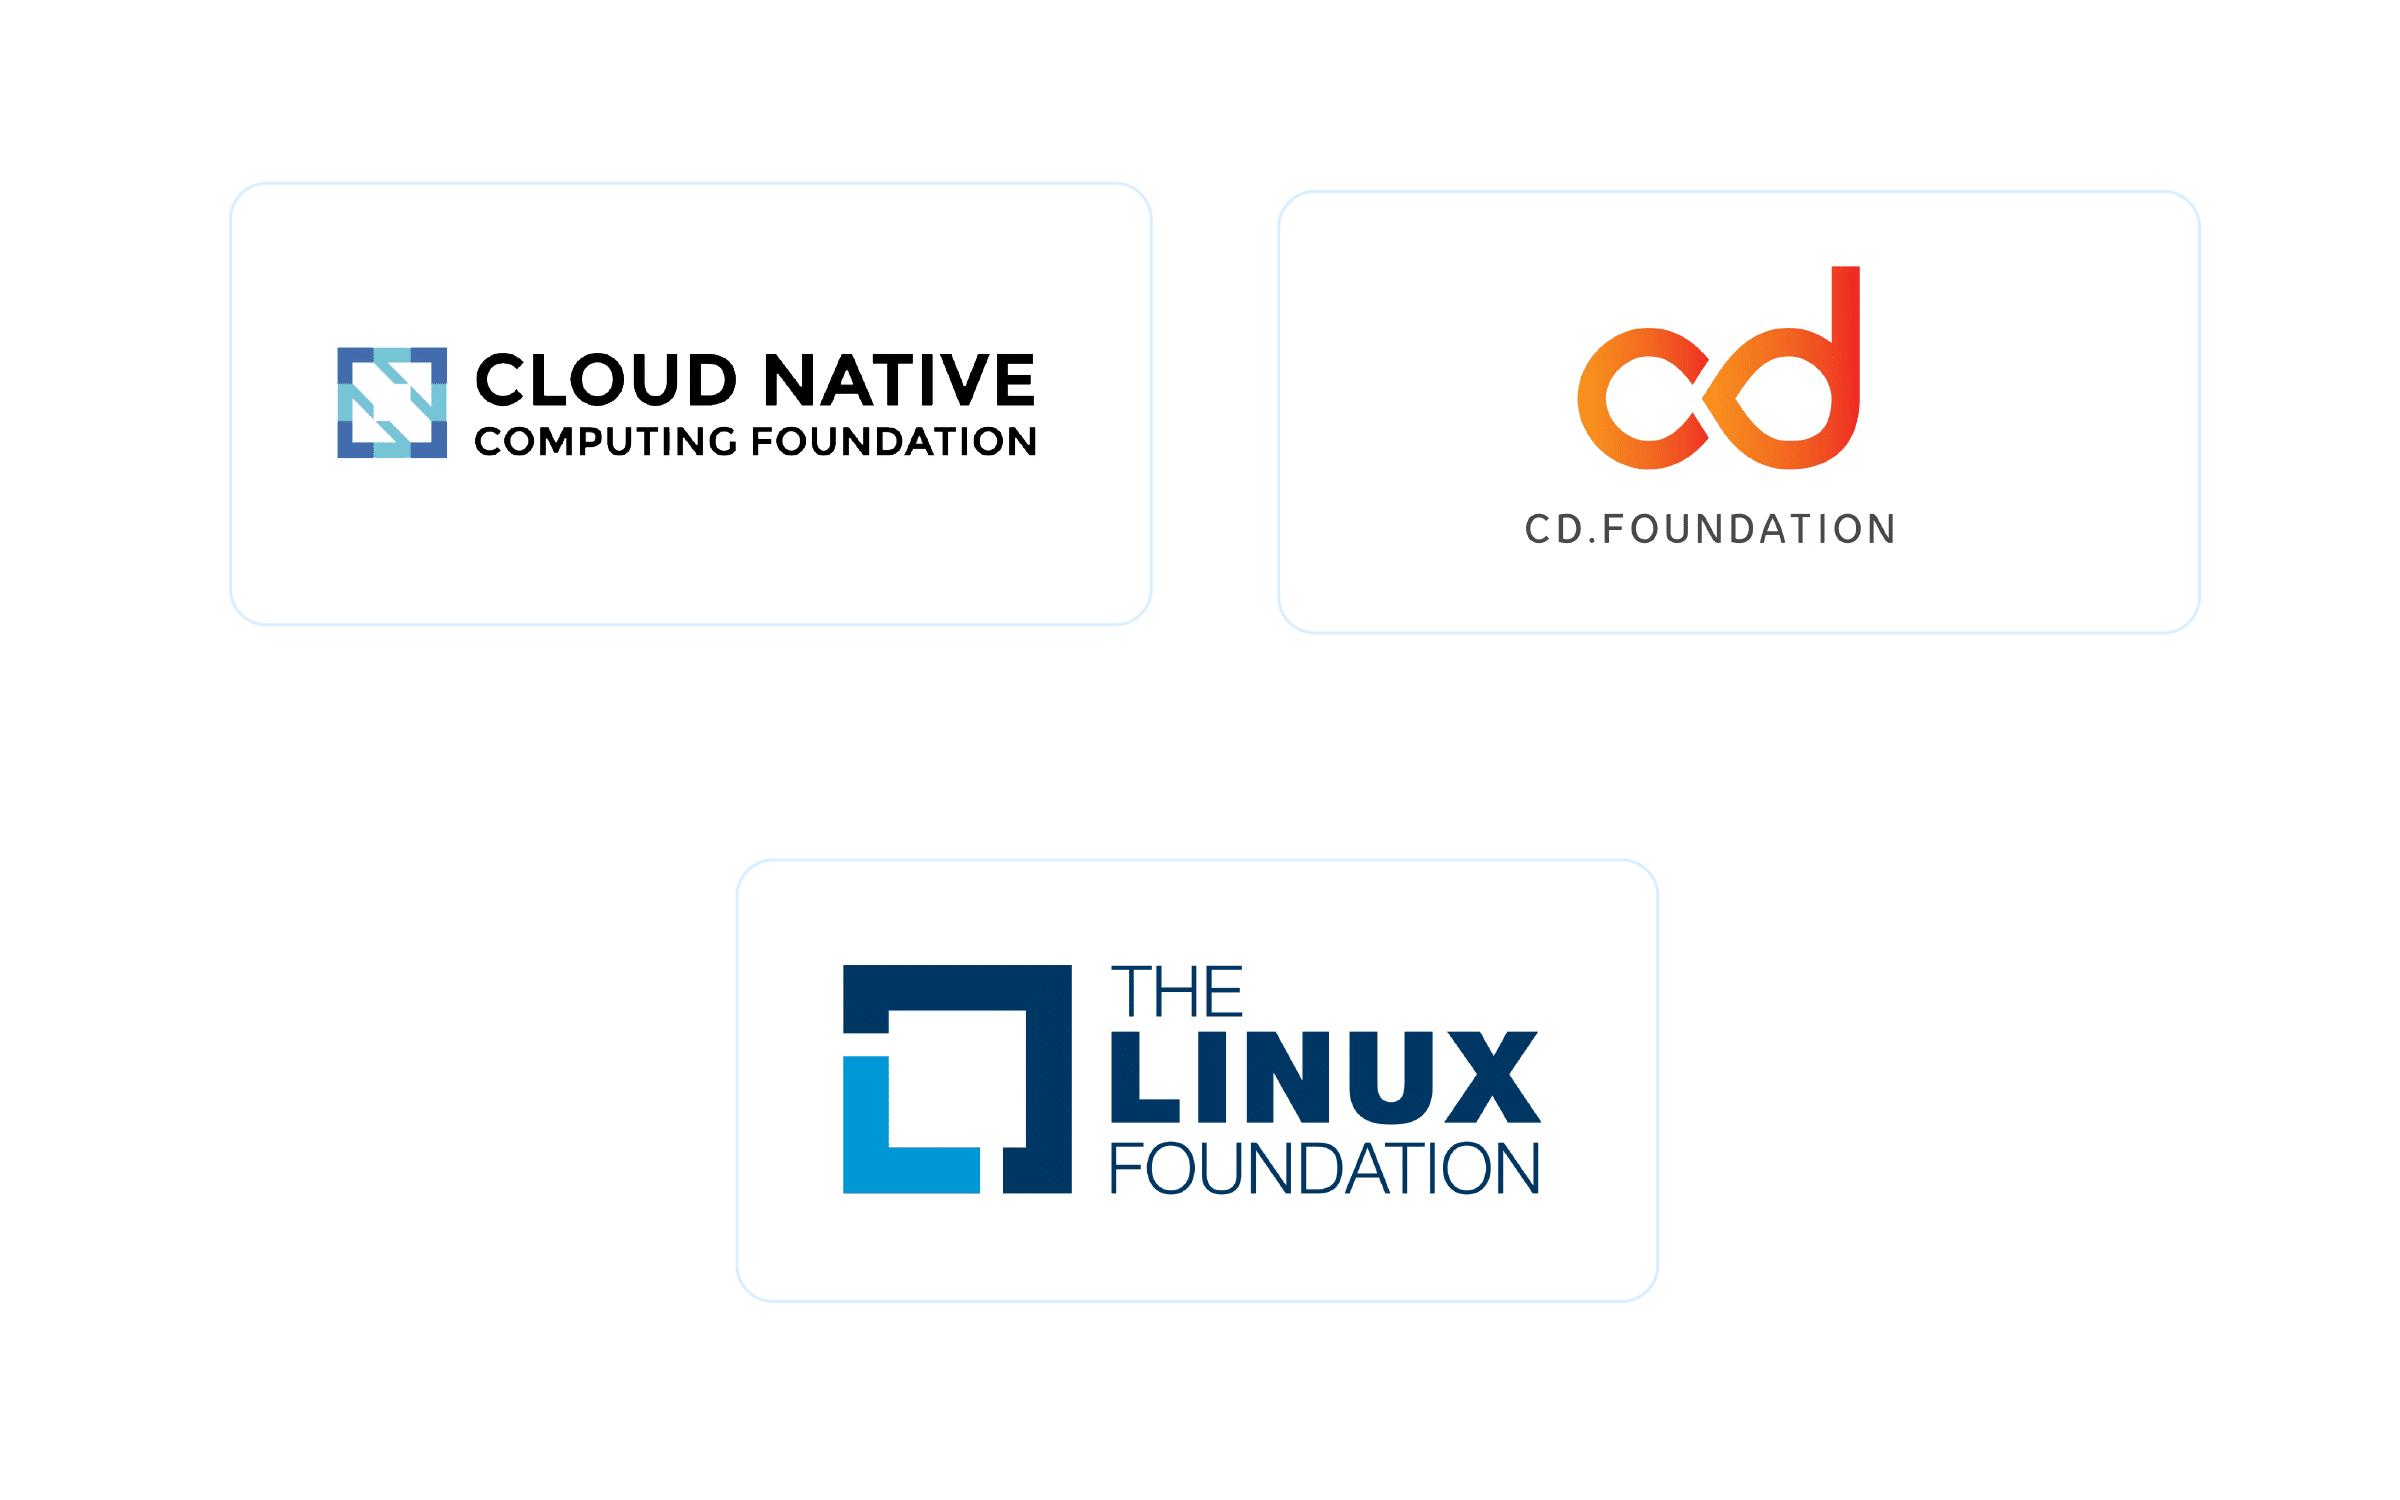 Partnerships and Alliances